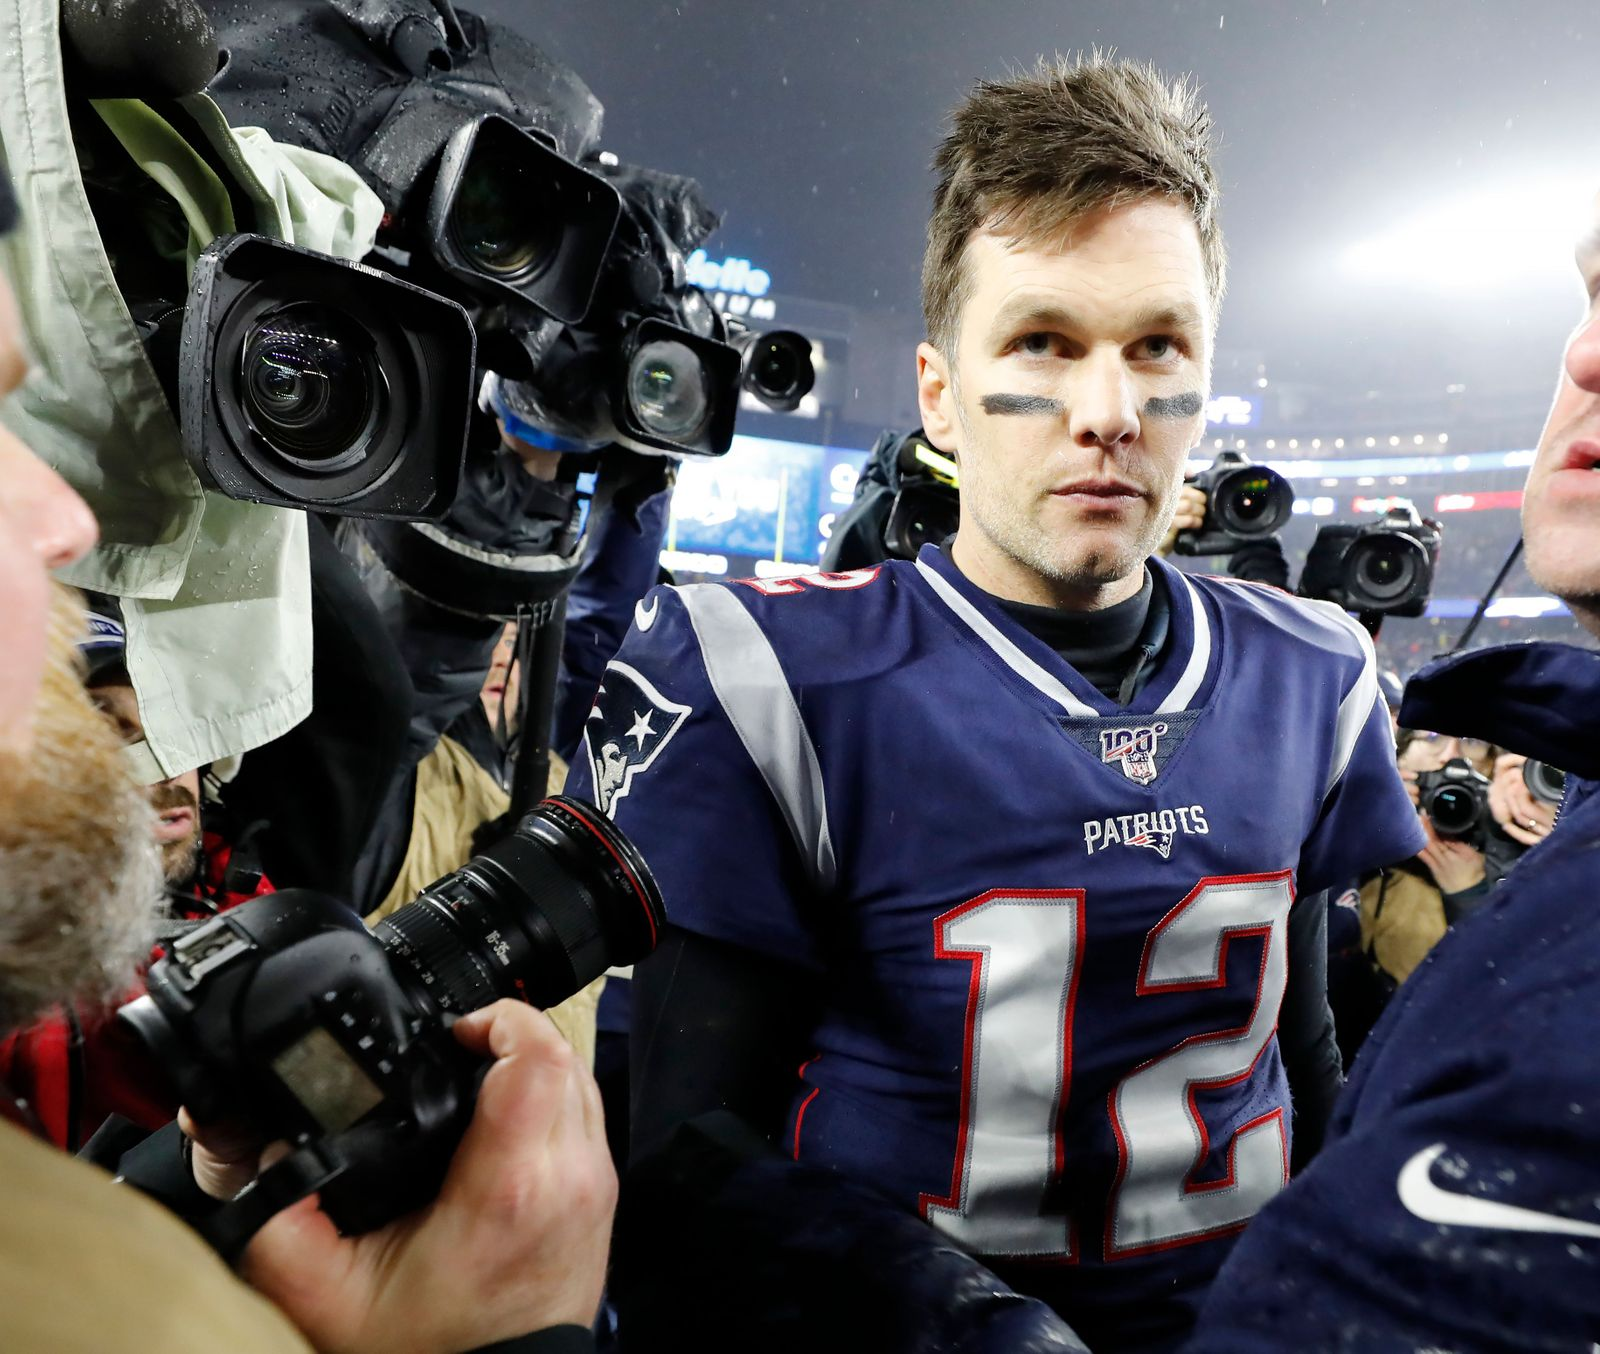 Tom Brady announces to leave the New England Patriots, Foxborough, USA - 04 Jan 2020